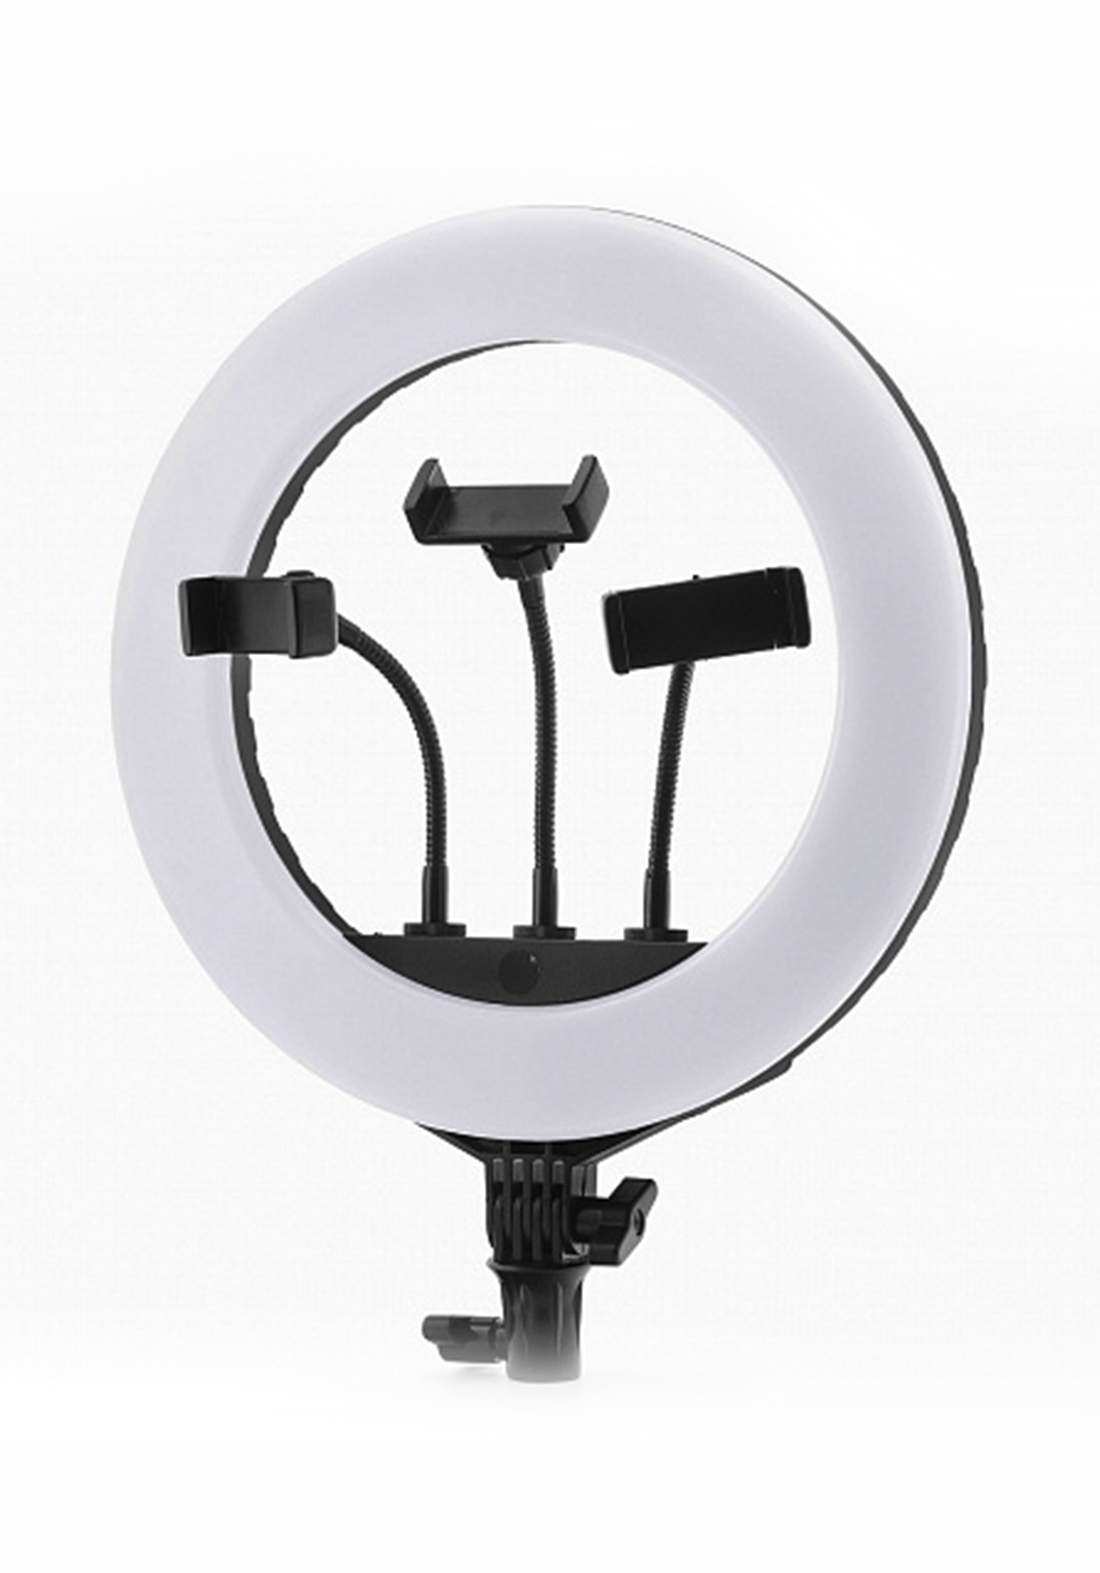 Jmary FM-21R  21 inch Ring lamp With Stand حلقة التصوير المضيئة